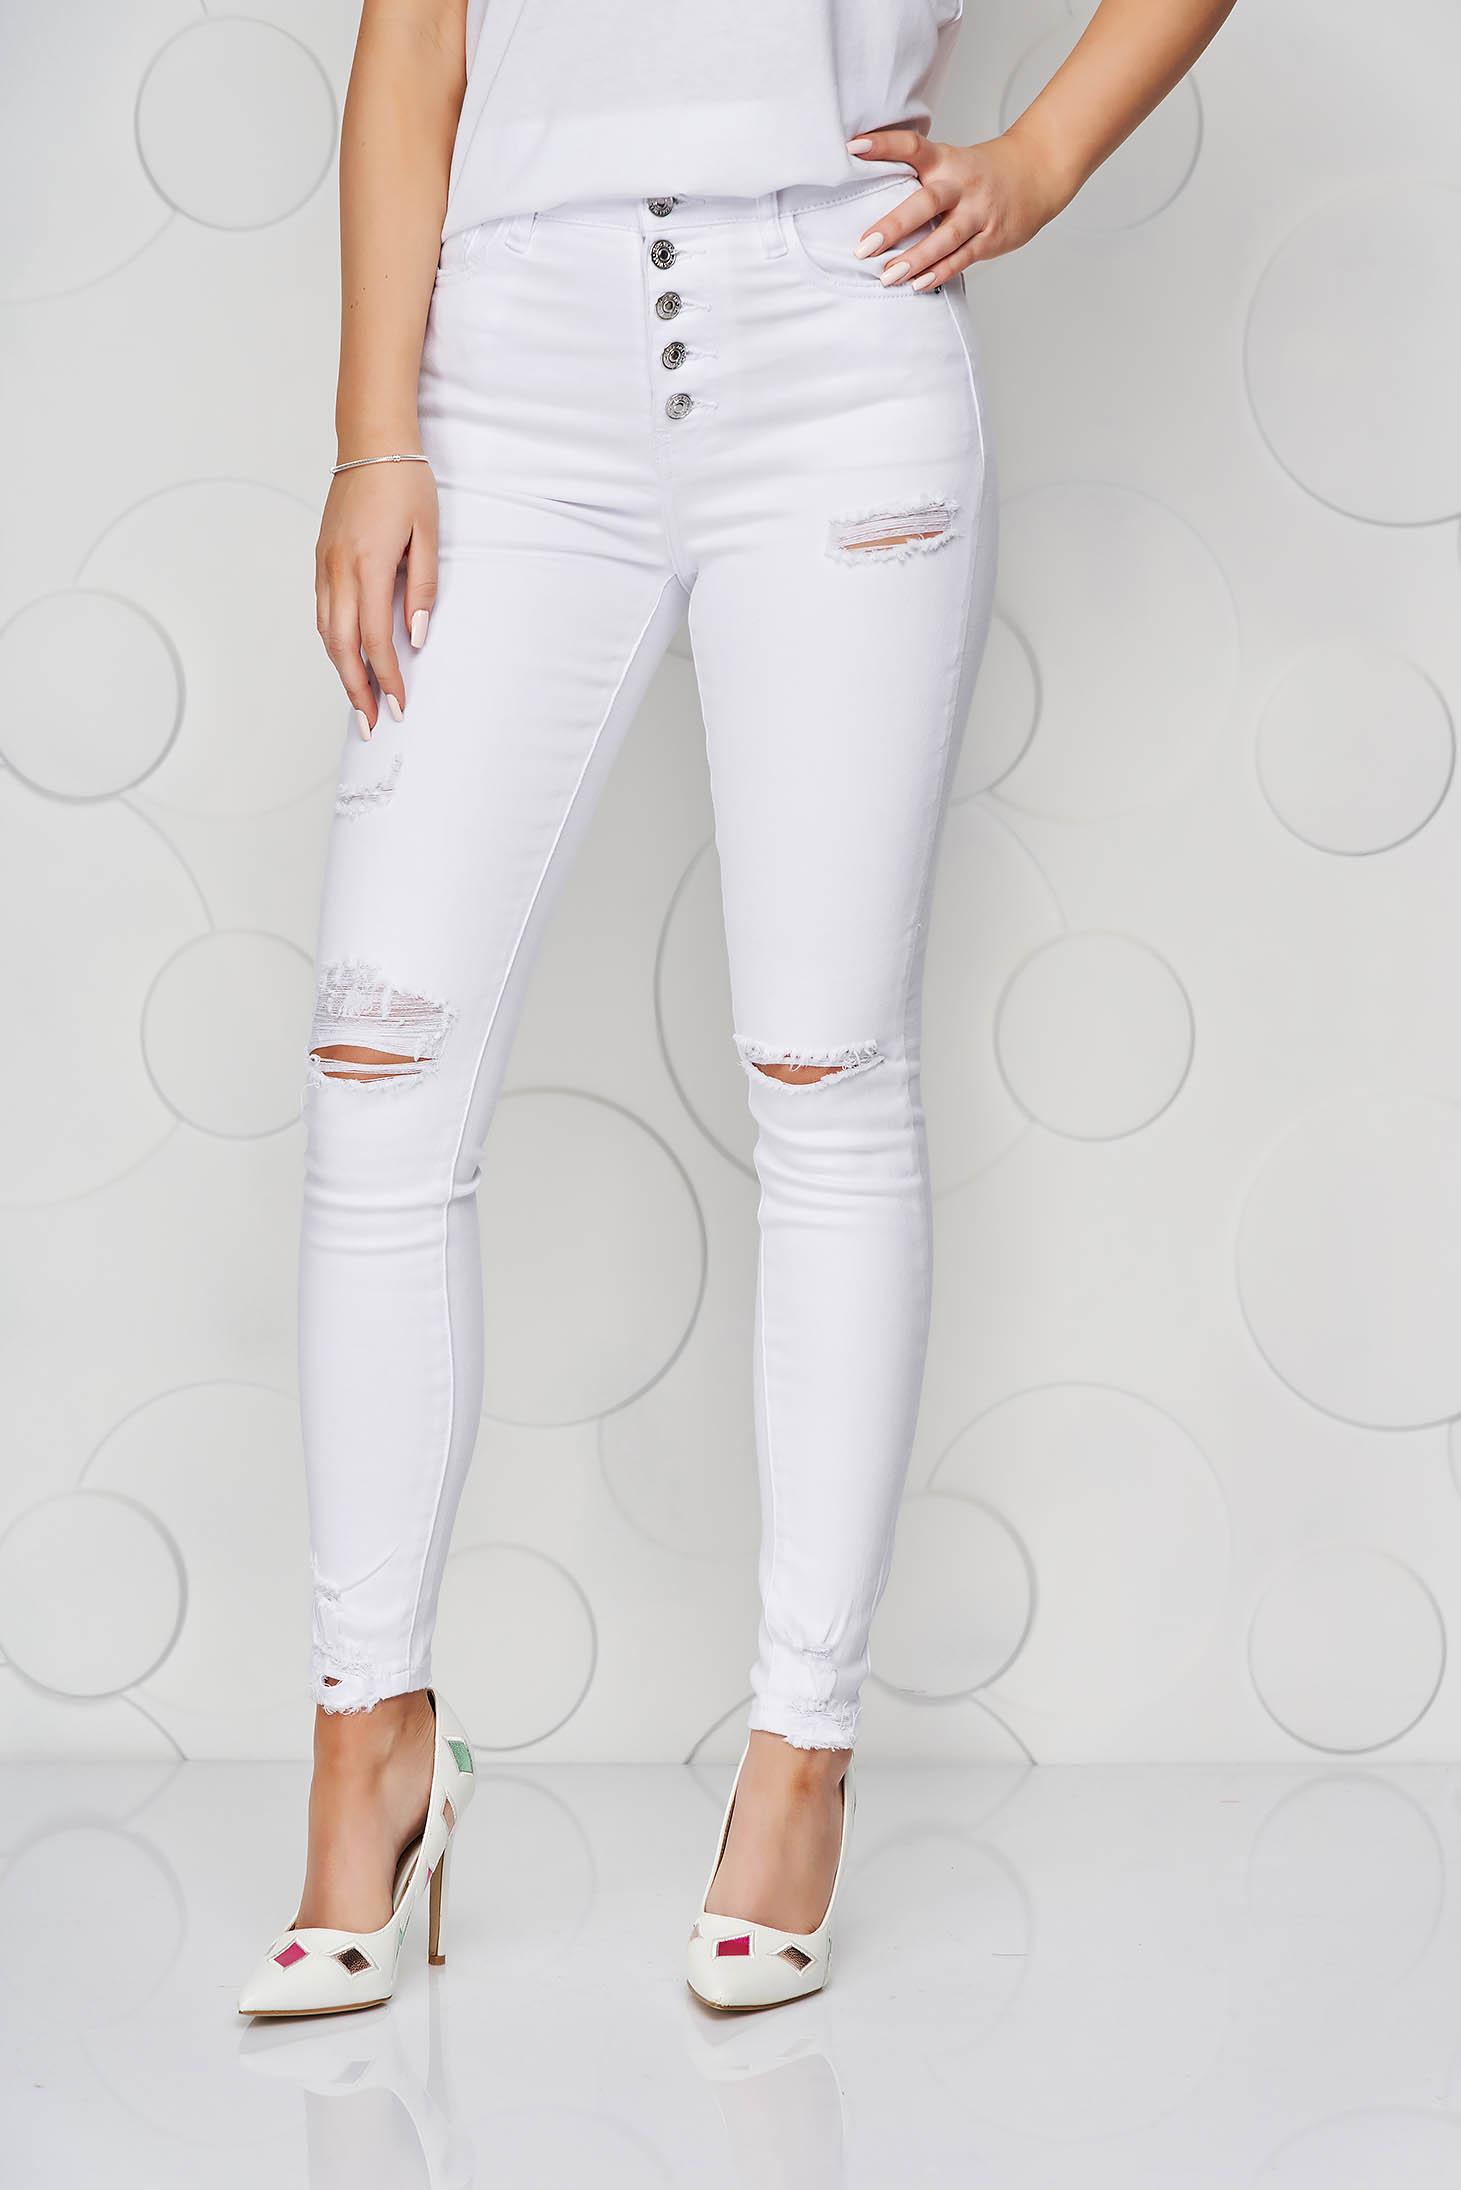 White jeans denim high waisted skinny jeans